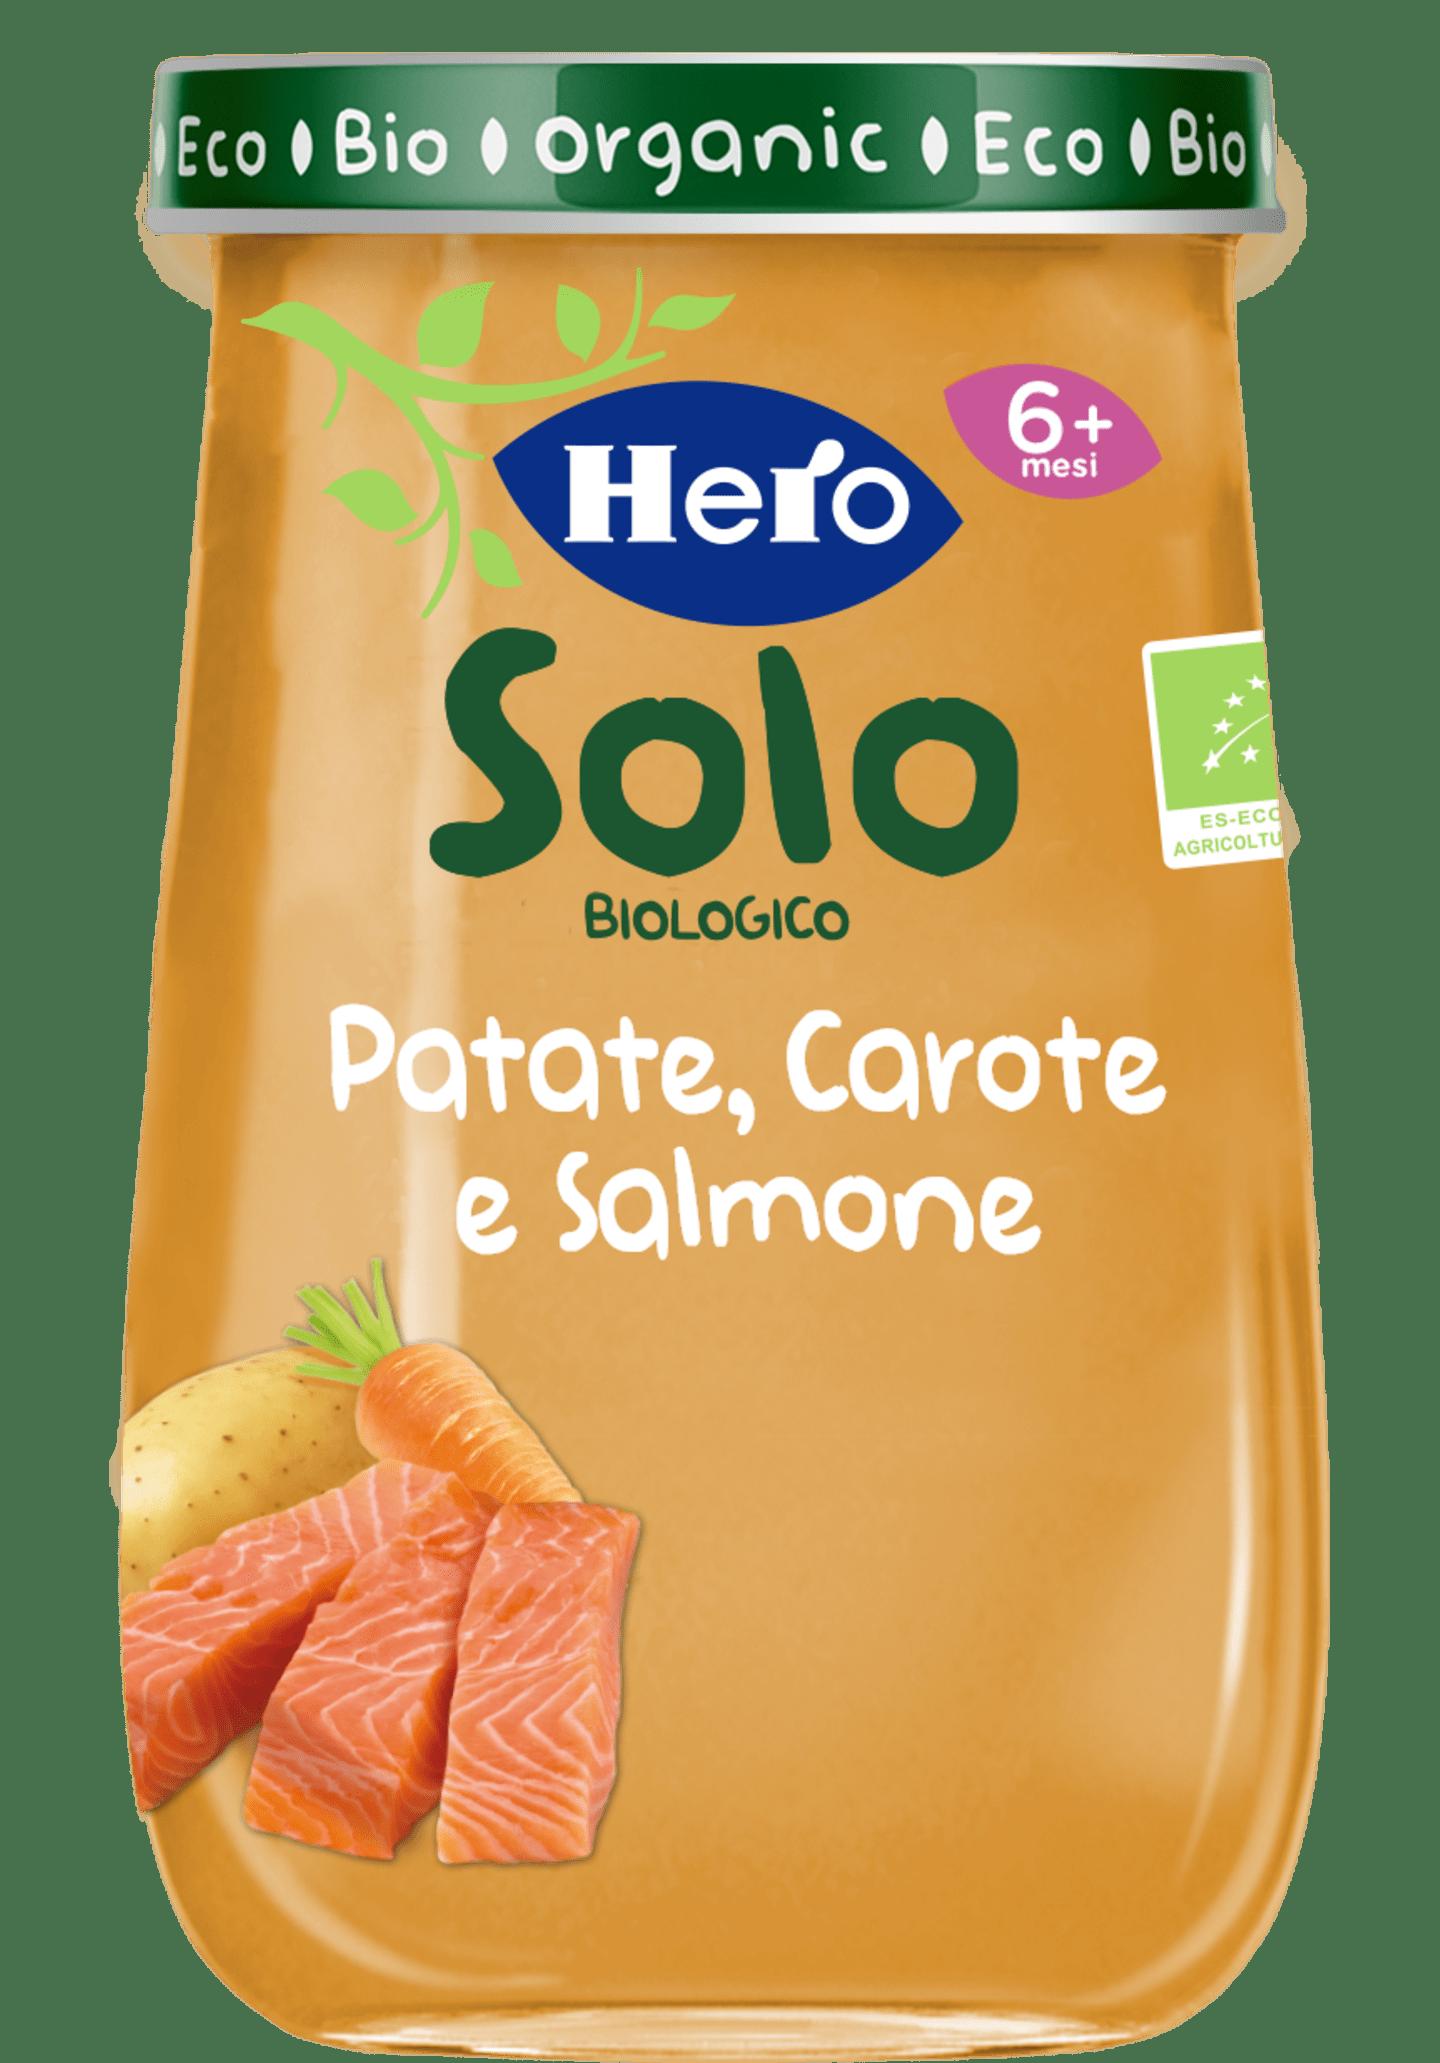 PATATE, CAROTE E SALMONE